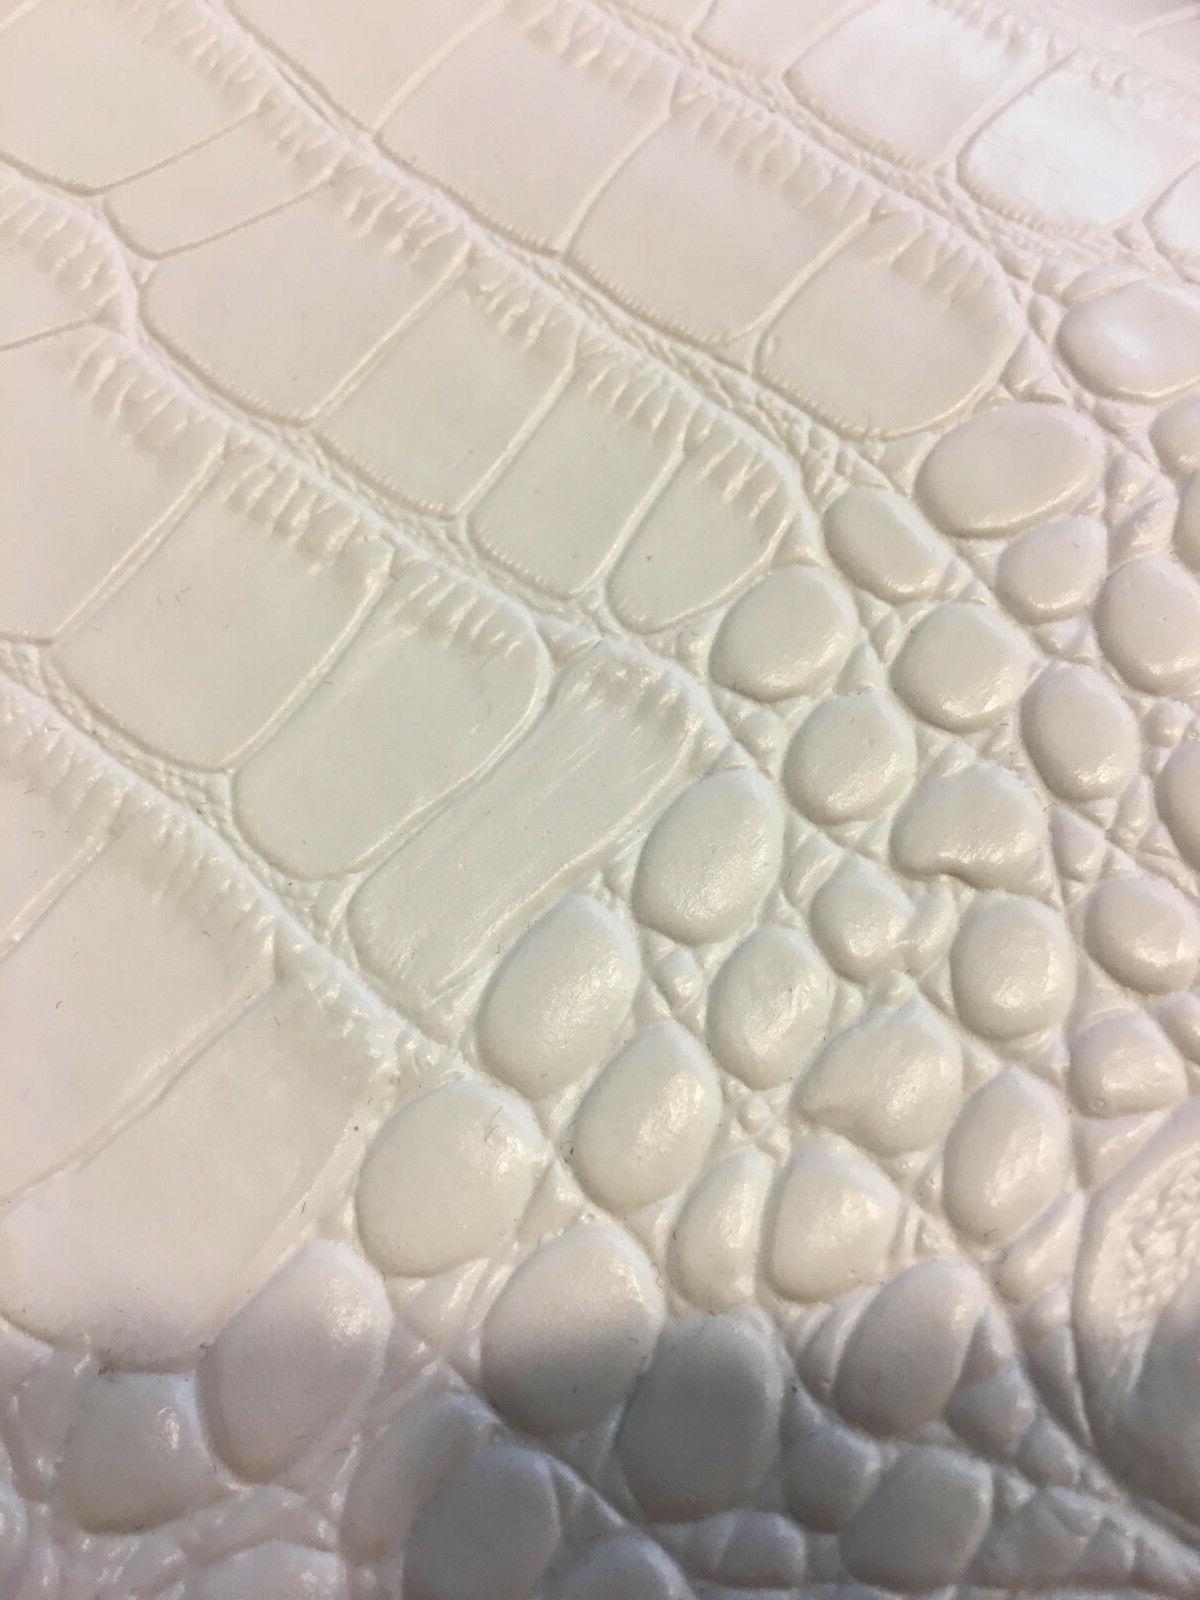 BIG CROCODILE Texture Leather Vinyl